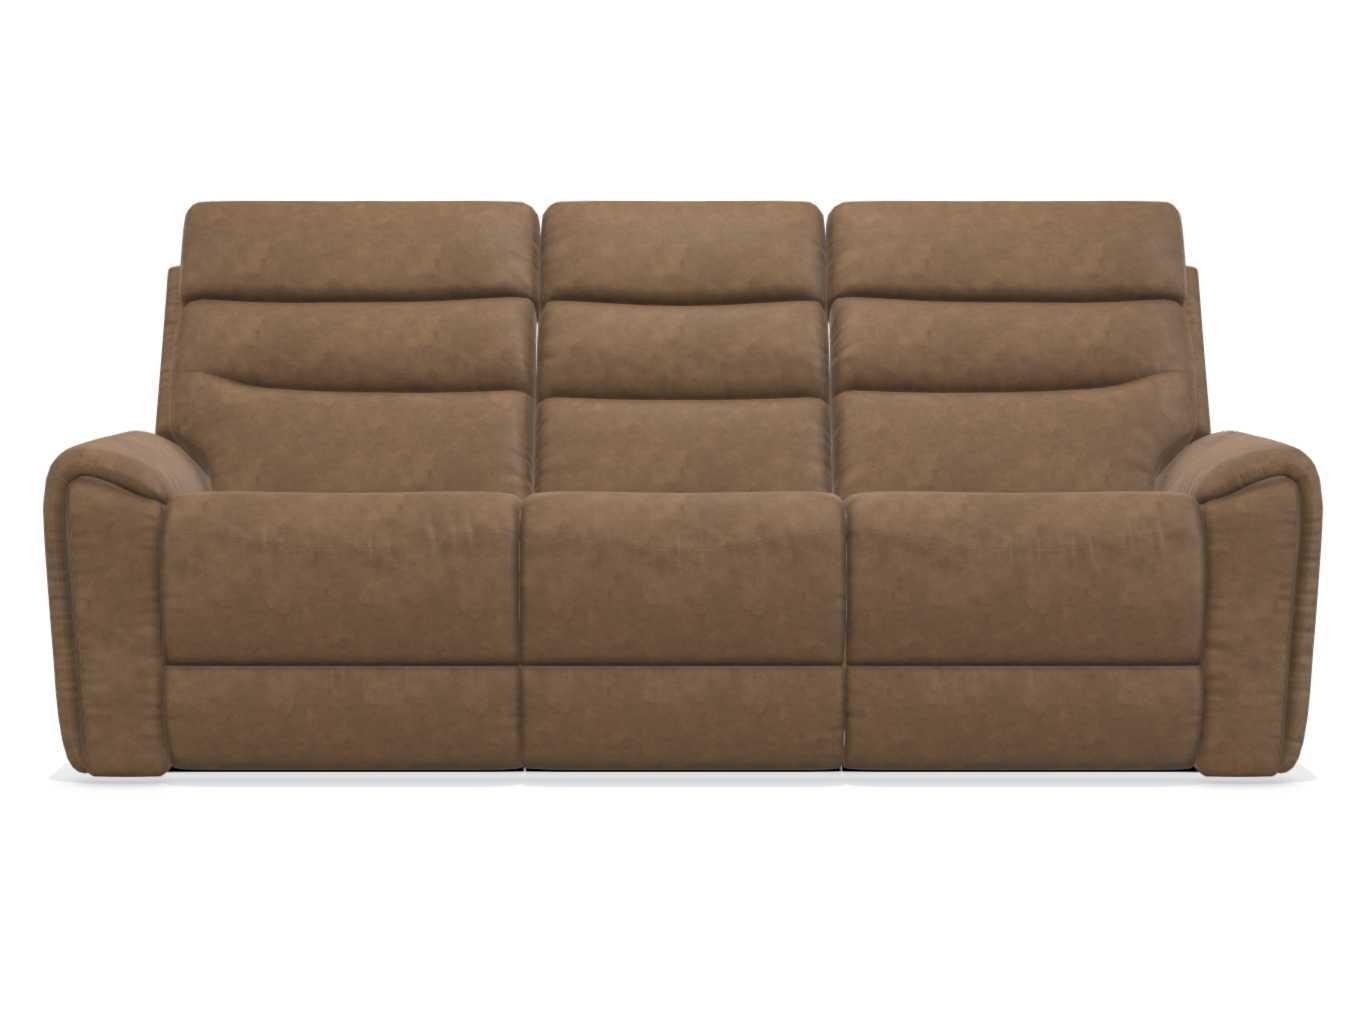 Soren Power Reclining Sofa w/ Headrest